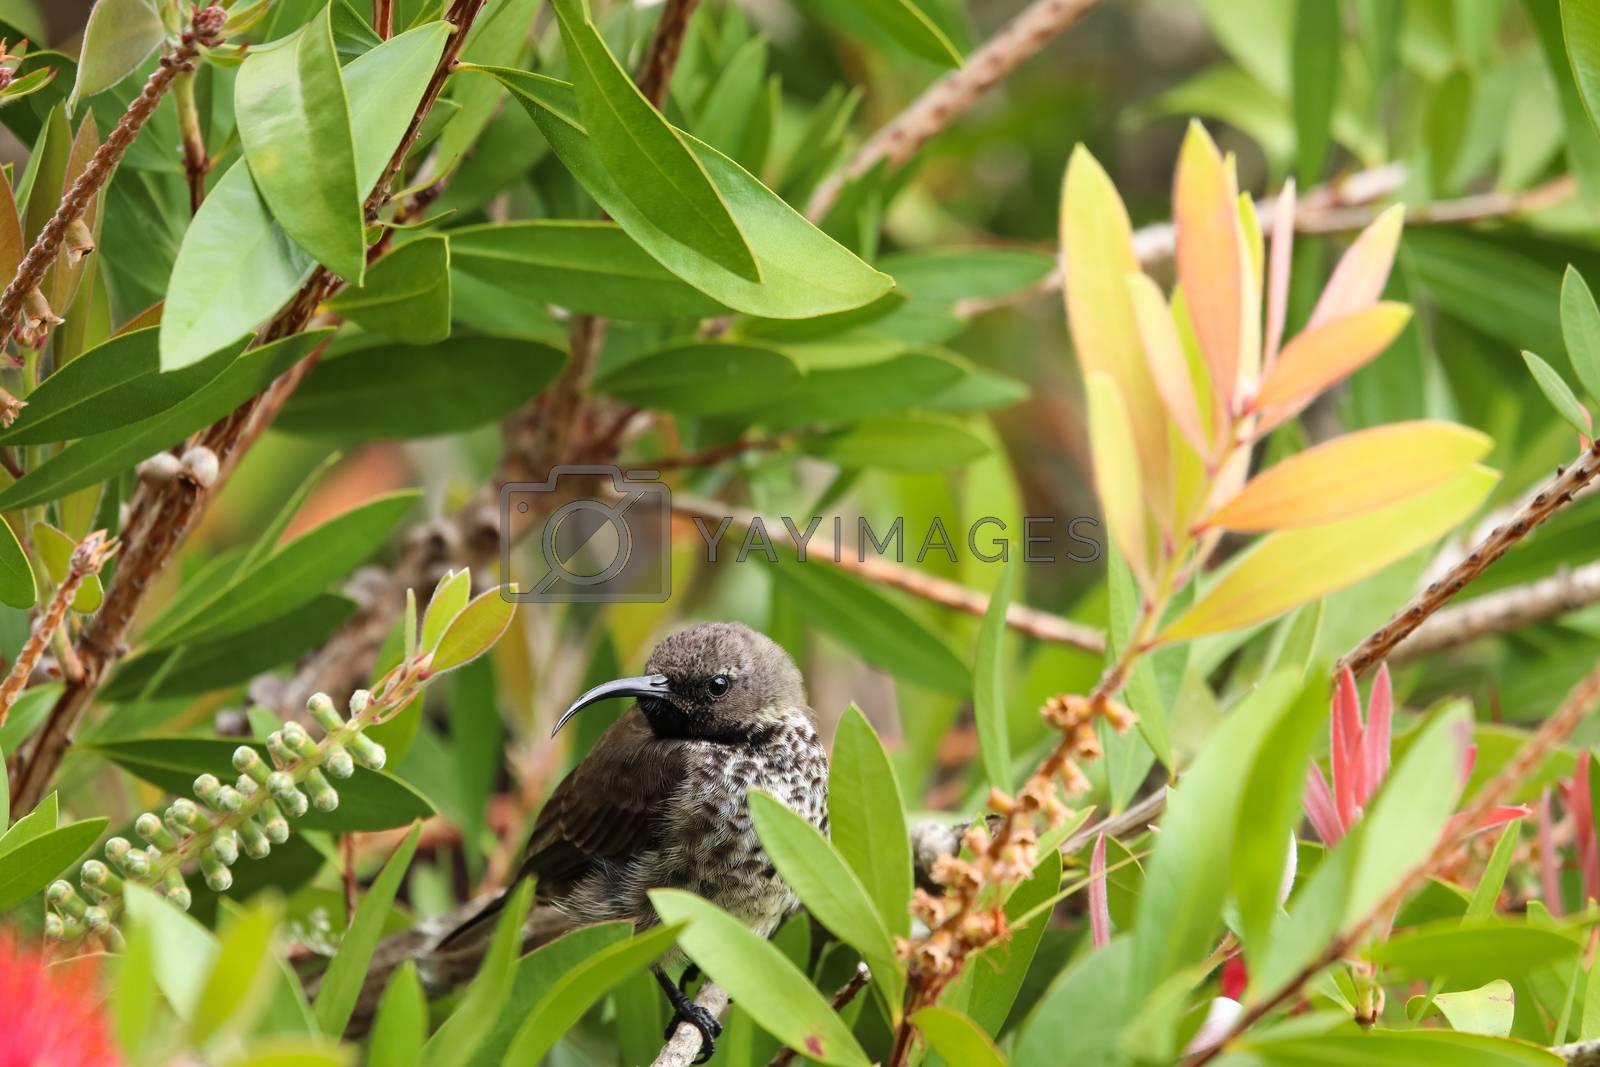 A black sunbird female (Nectarinia amethystina) perched on a bottlebrush tree branch, Plettenberg Bay, South Africa